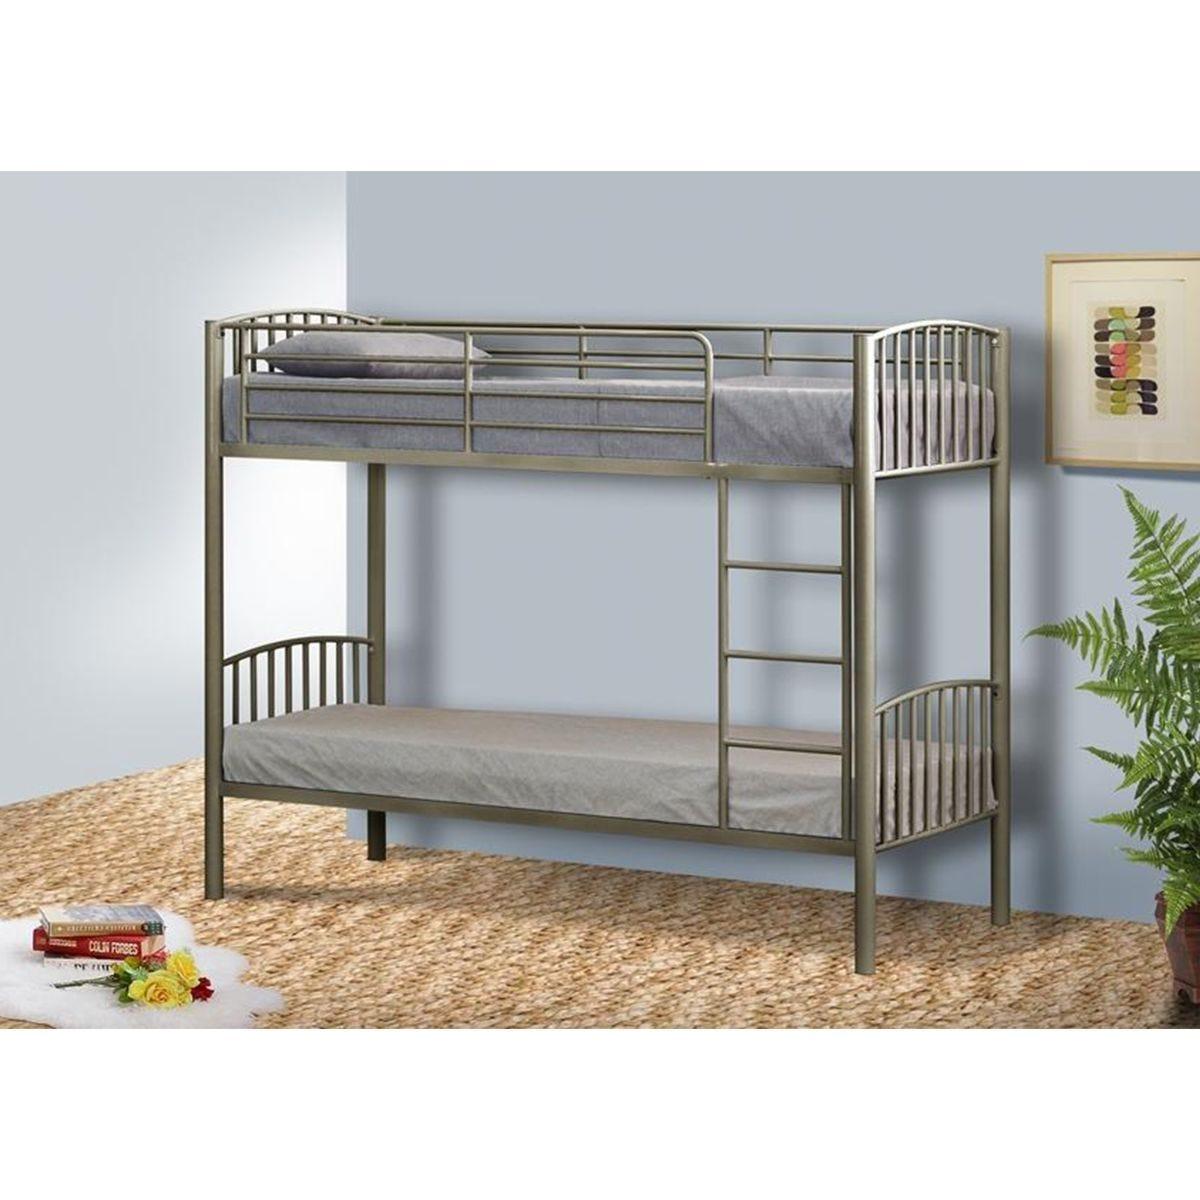 Dakota Bunk Bed - Silver